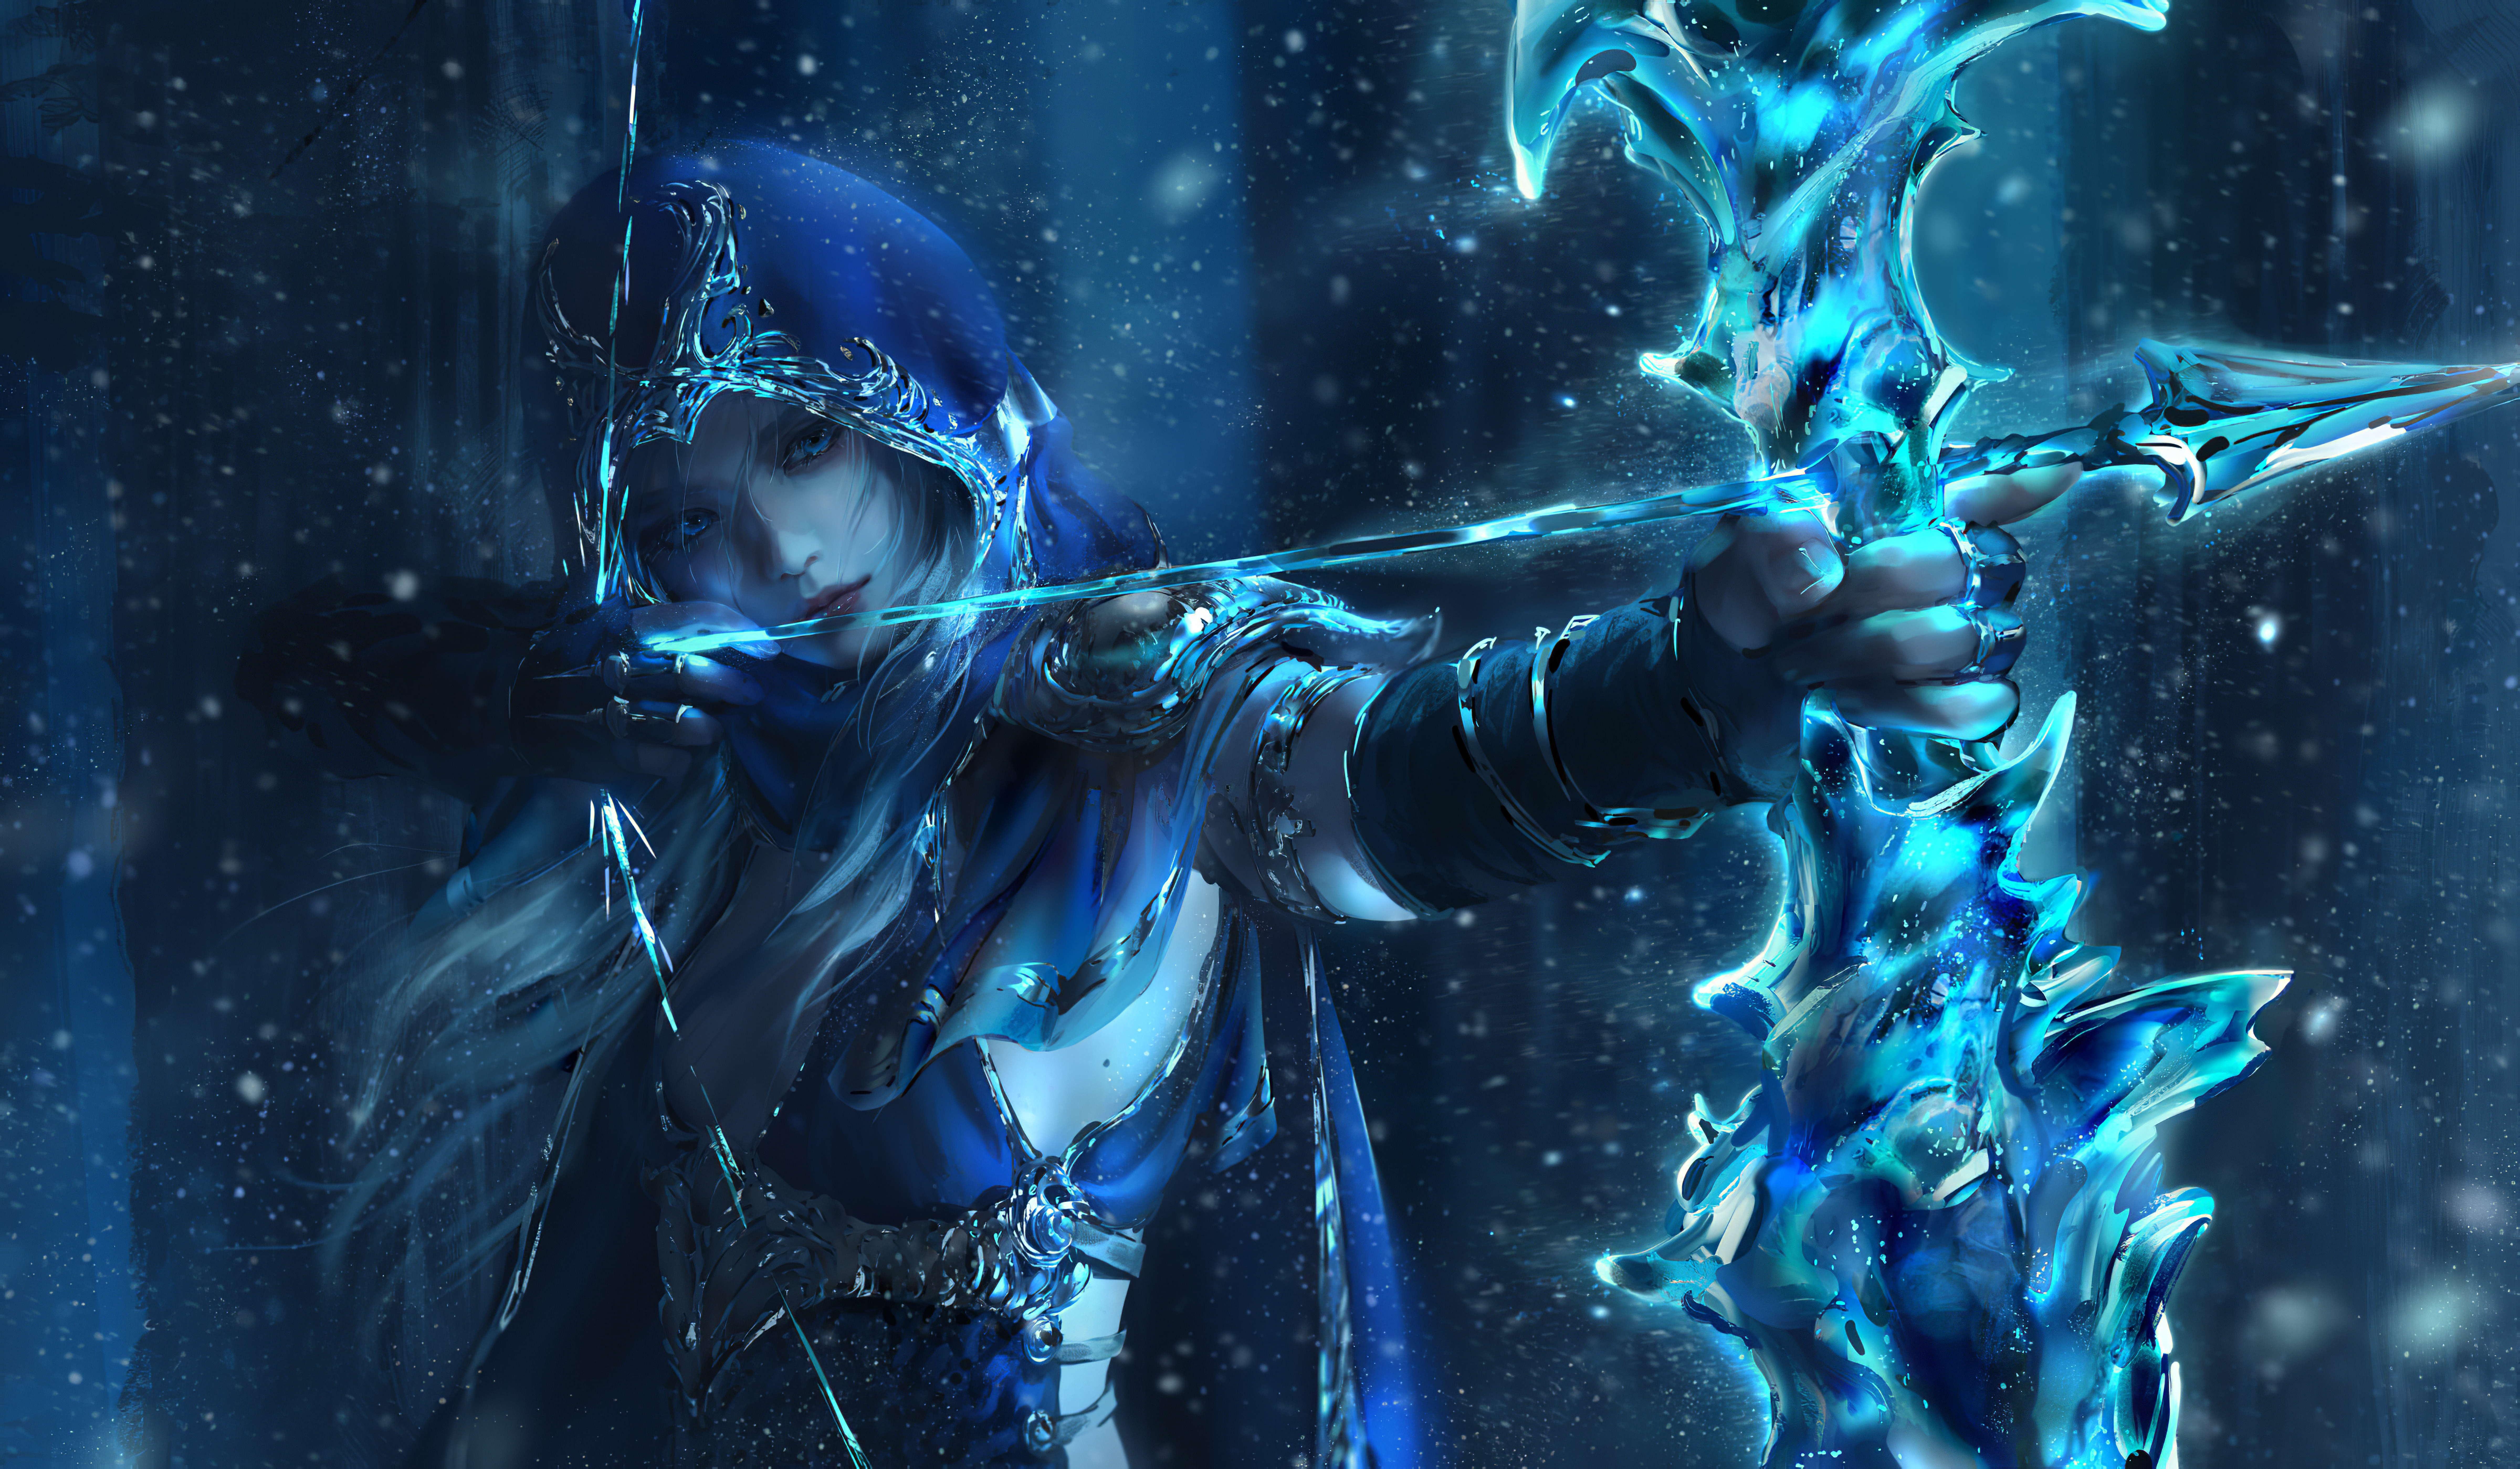 General 9600x5598 League of Legends Ashe (League of Legends) video game art Nixeu arrows warrior fantasy art bow bodysuit PC gaming video game girls archer women hoods aiming fantasy girl blue